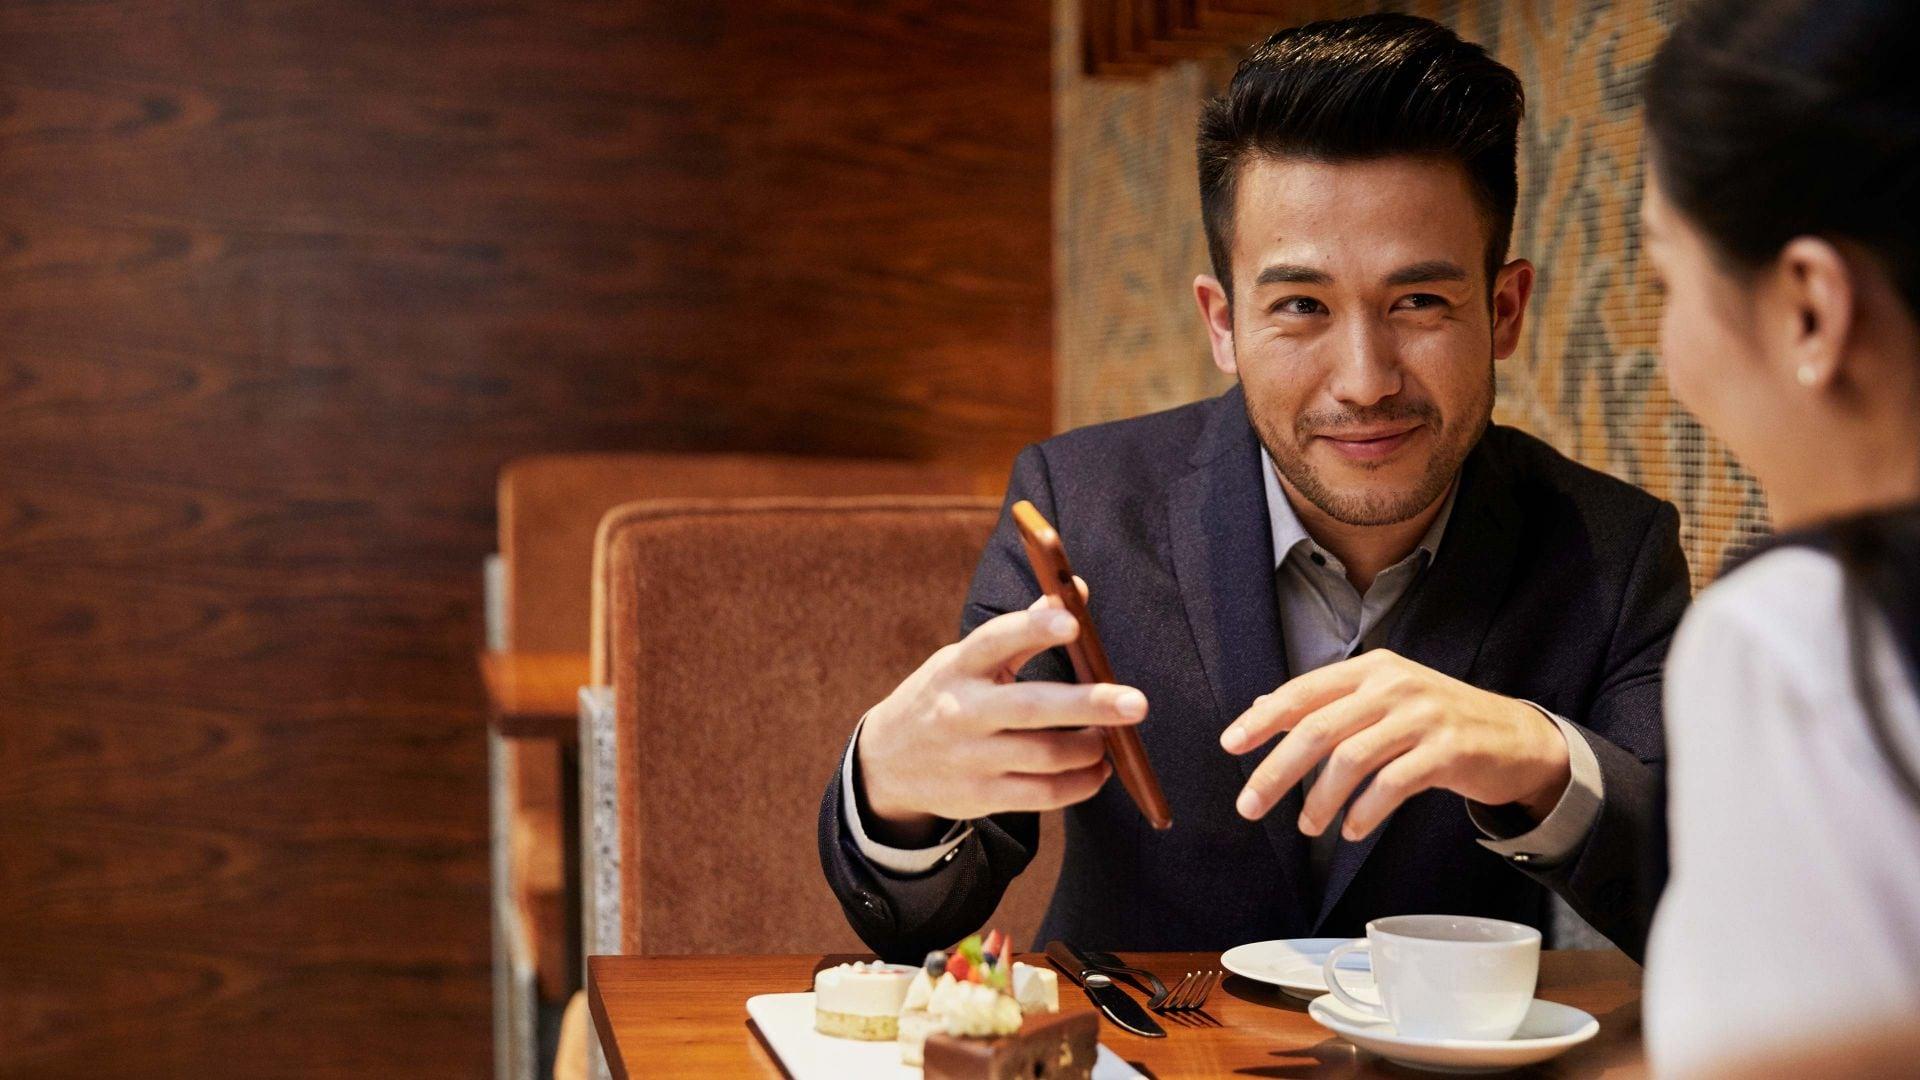 Lifestyle Food and Beverage Couple Tea